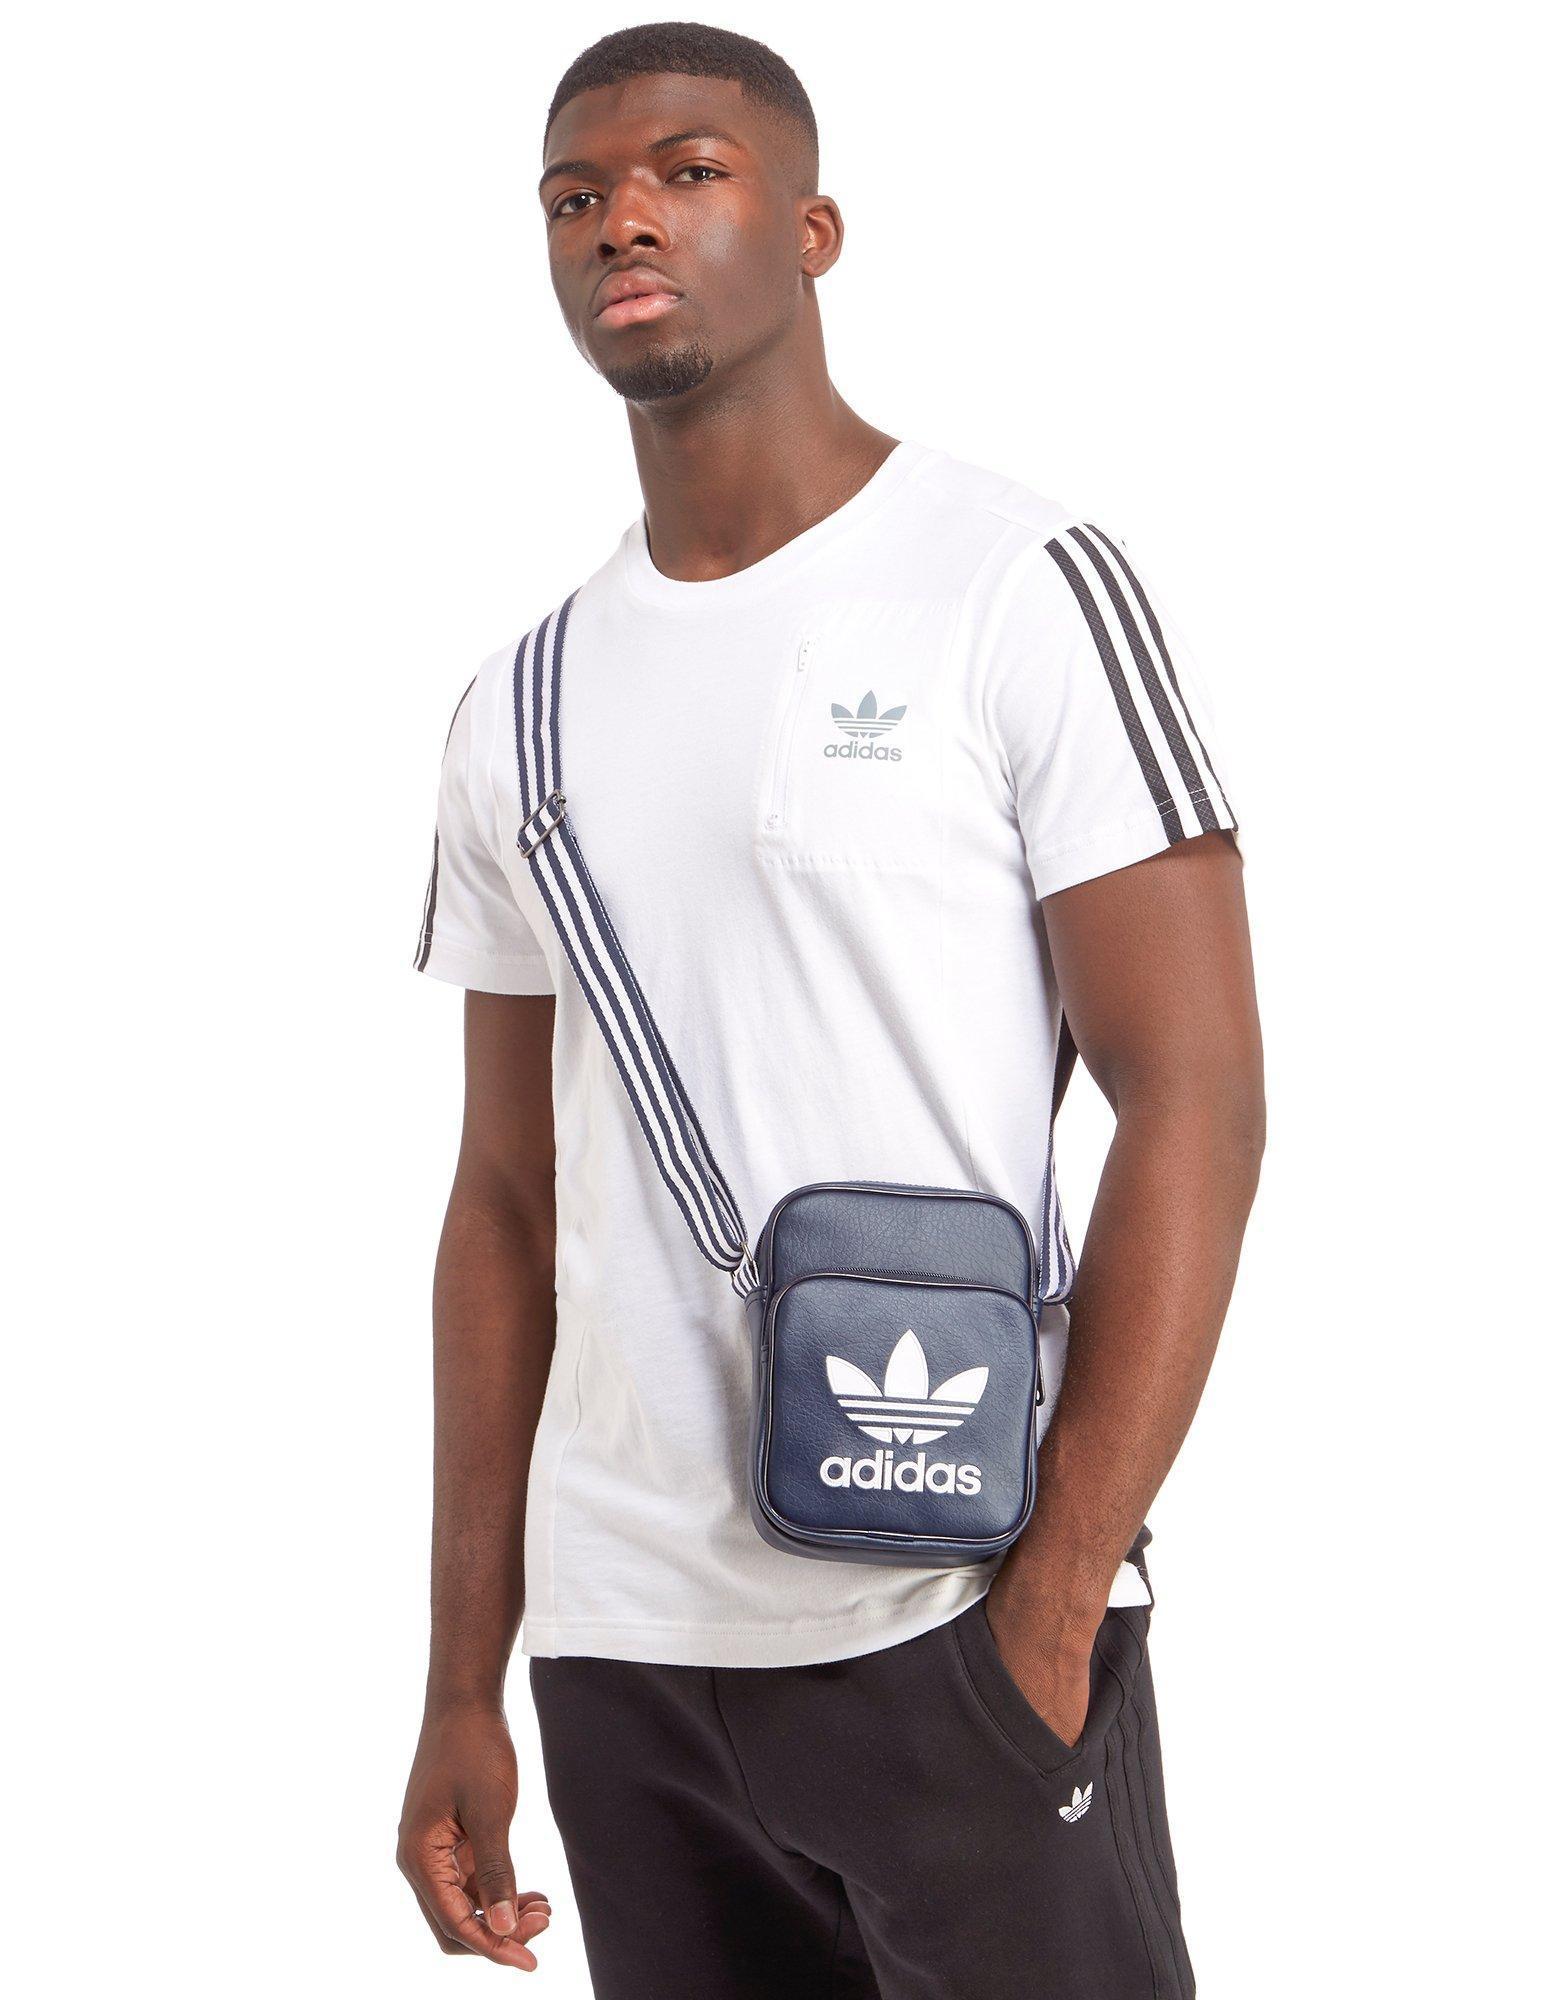 Lyst - adidas Originals Small Items Bag in Blue for Men d238b2b1b8ede